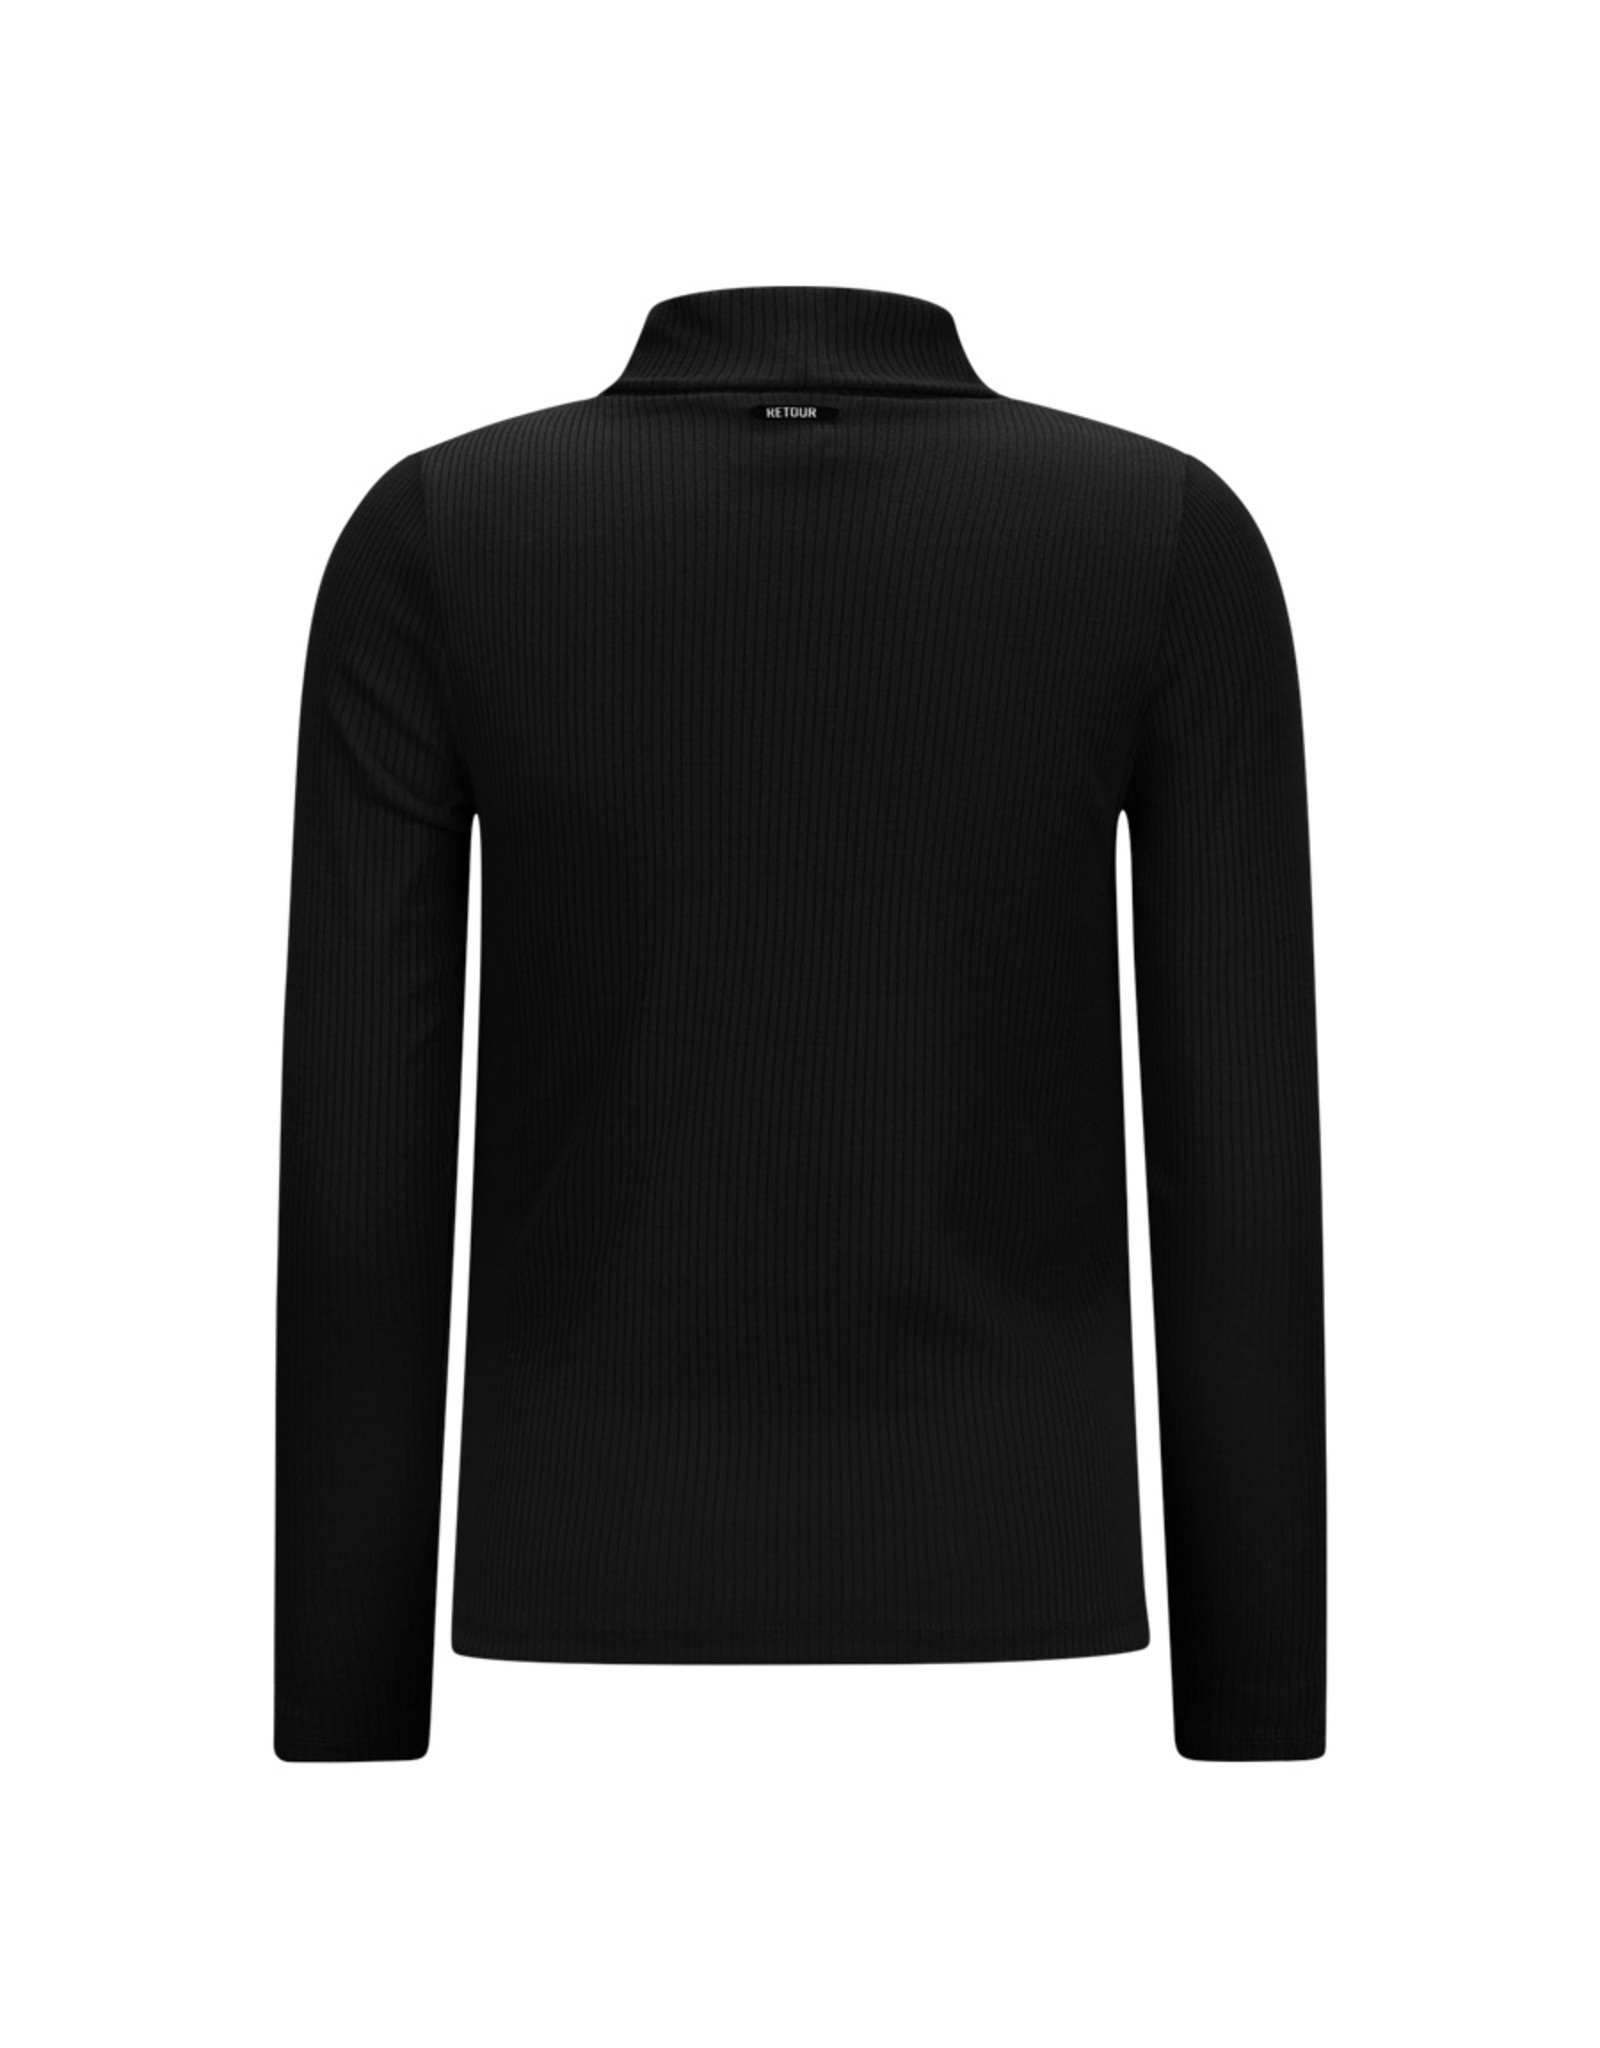 Retour Jeans Girls Mirella T-Shirts Black